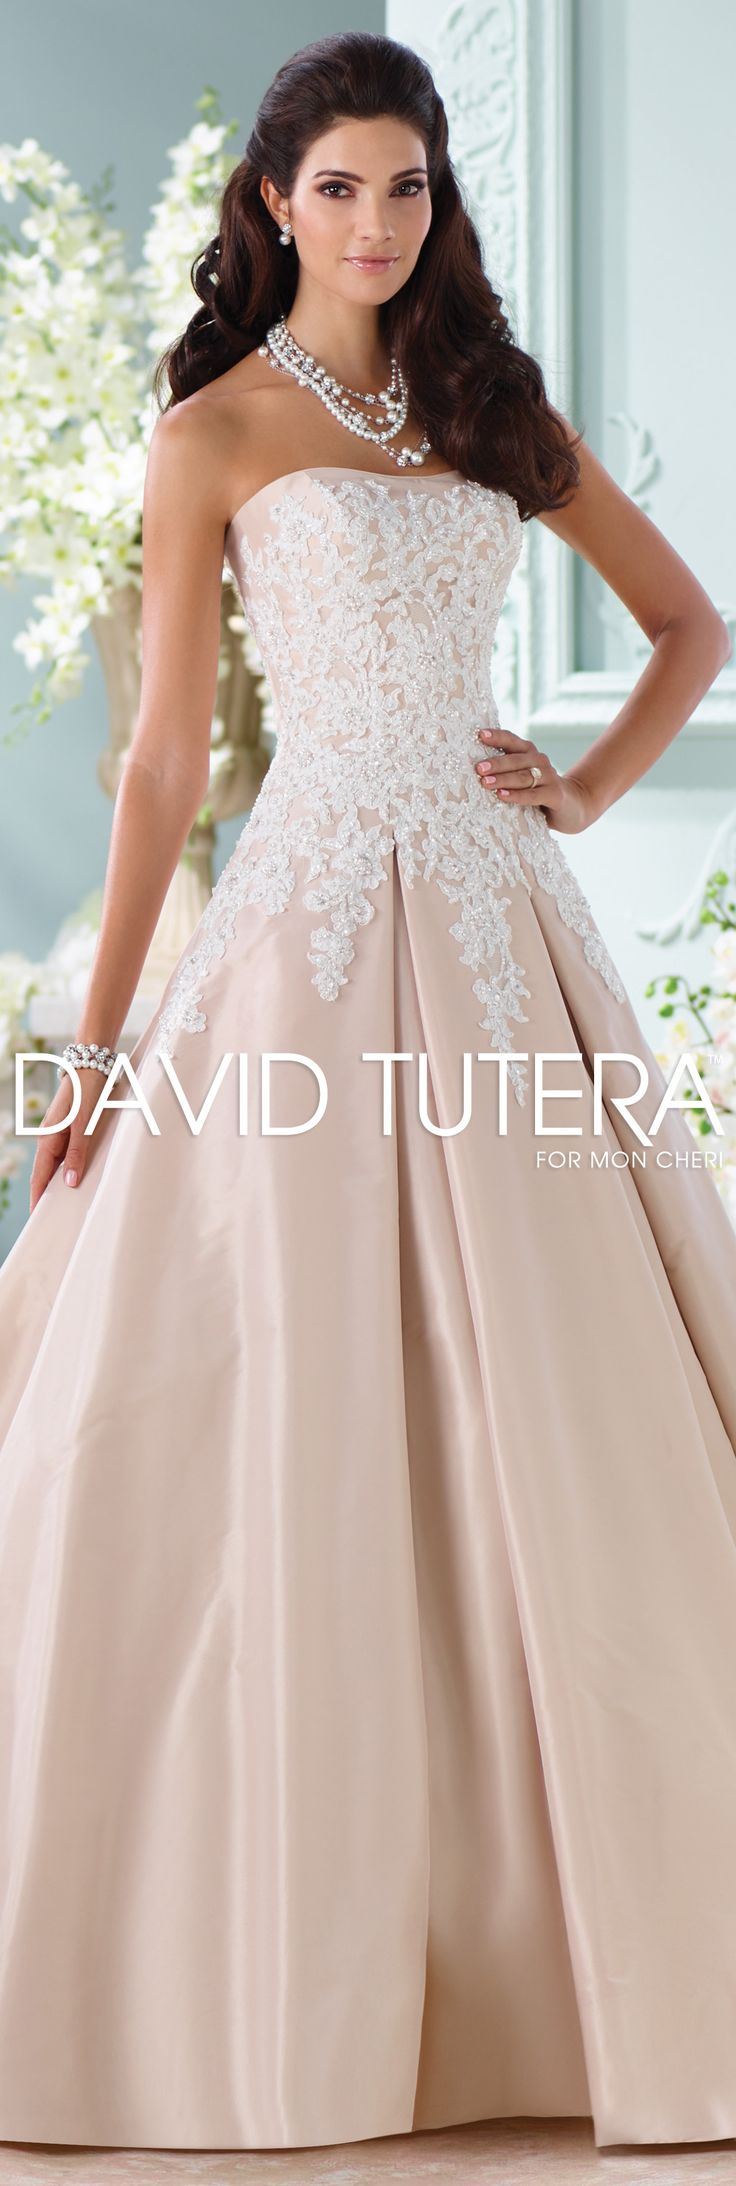 The David Tutera for Mon Cheri Spring 2016 Wedding Gown Collection - Style No. 116217 Alleen  #laceweddingdresses